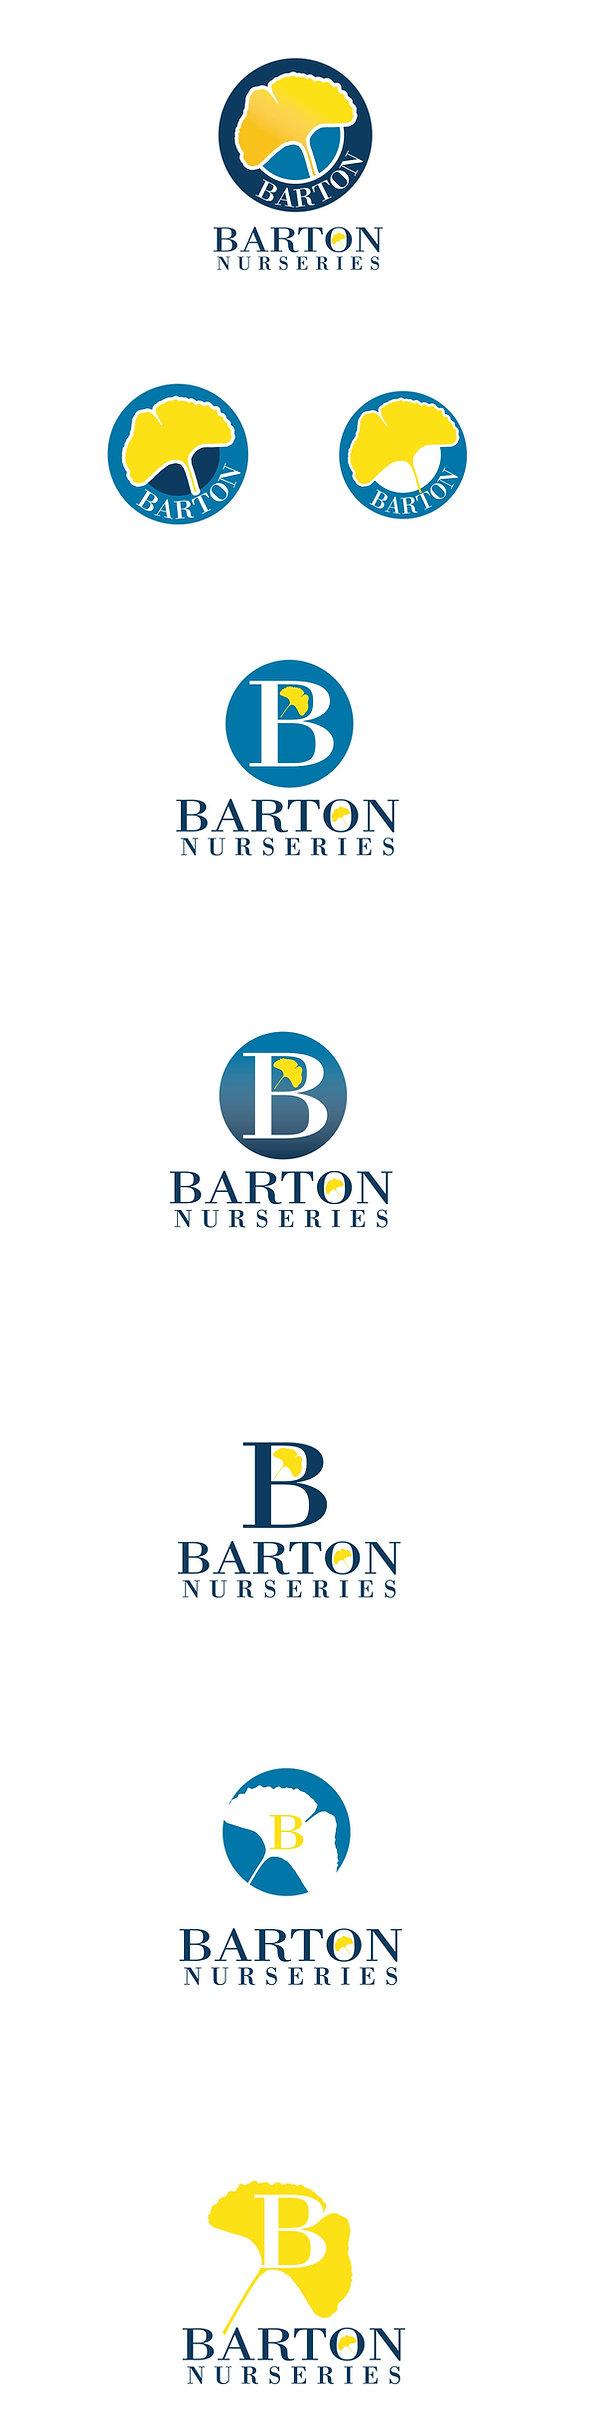 Barton-Nurseries-Logo-Concepts-2020.jpg